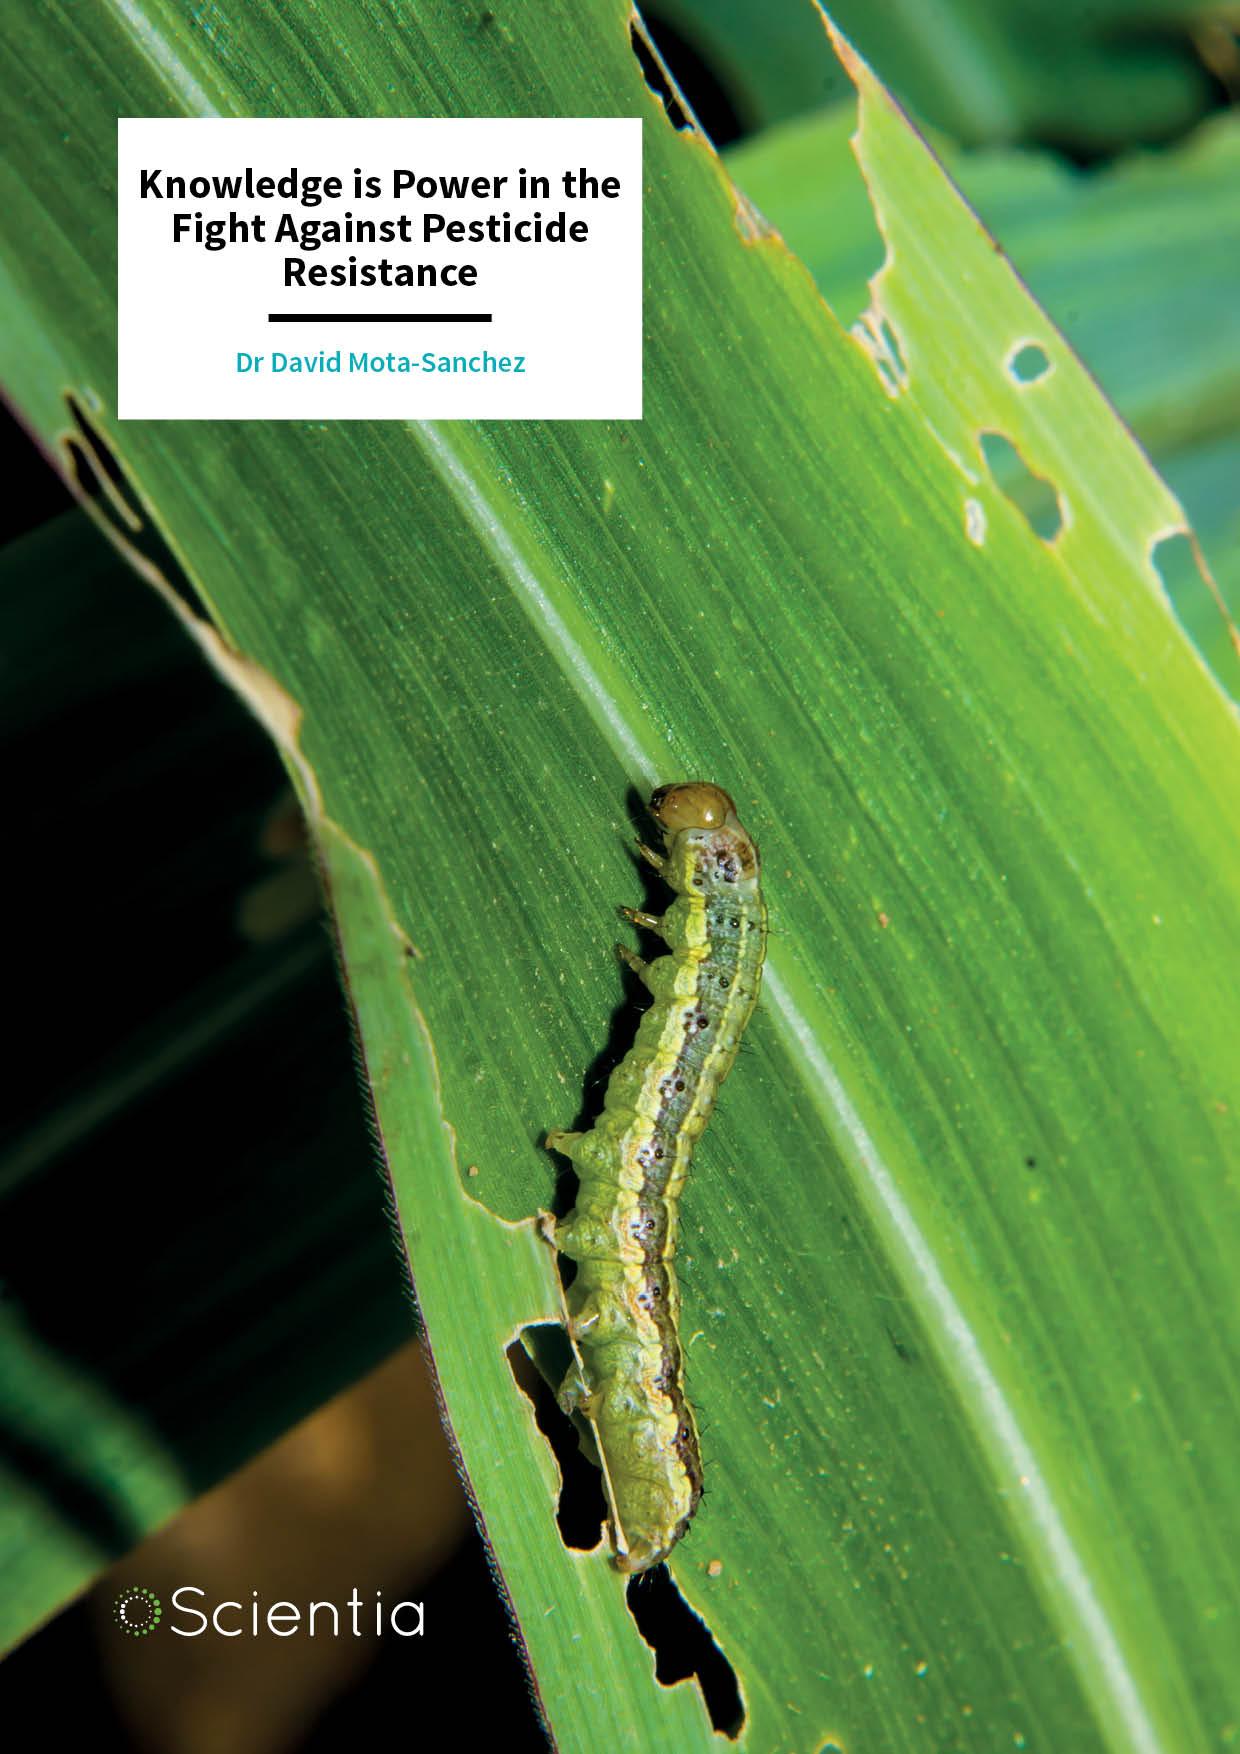 Dr David Mota-Sanchez – Knowledge is Power in the Fight Against Pesticide Resistance